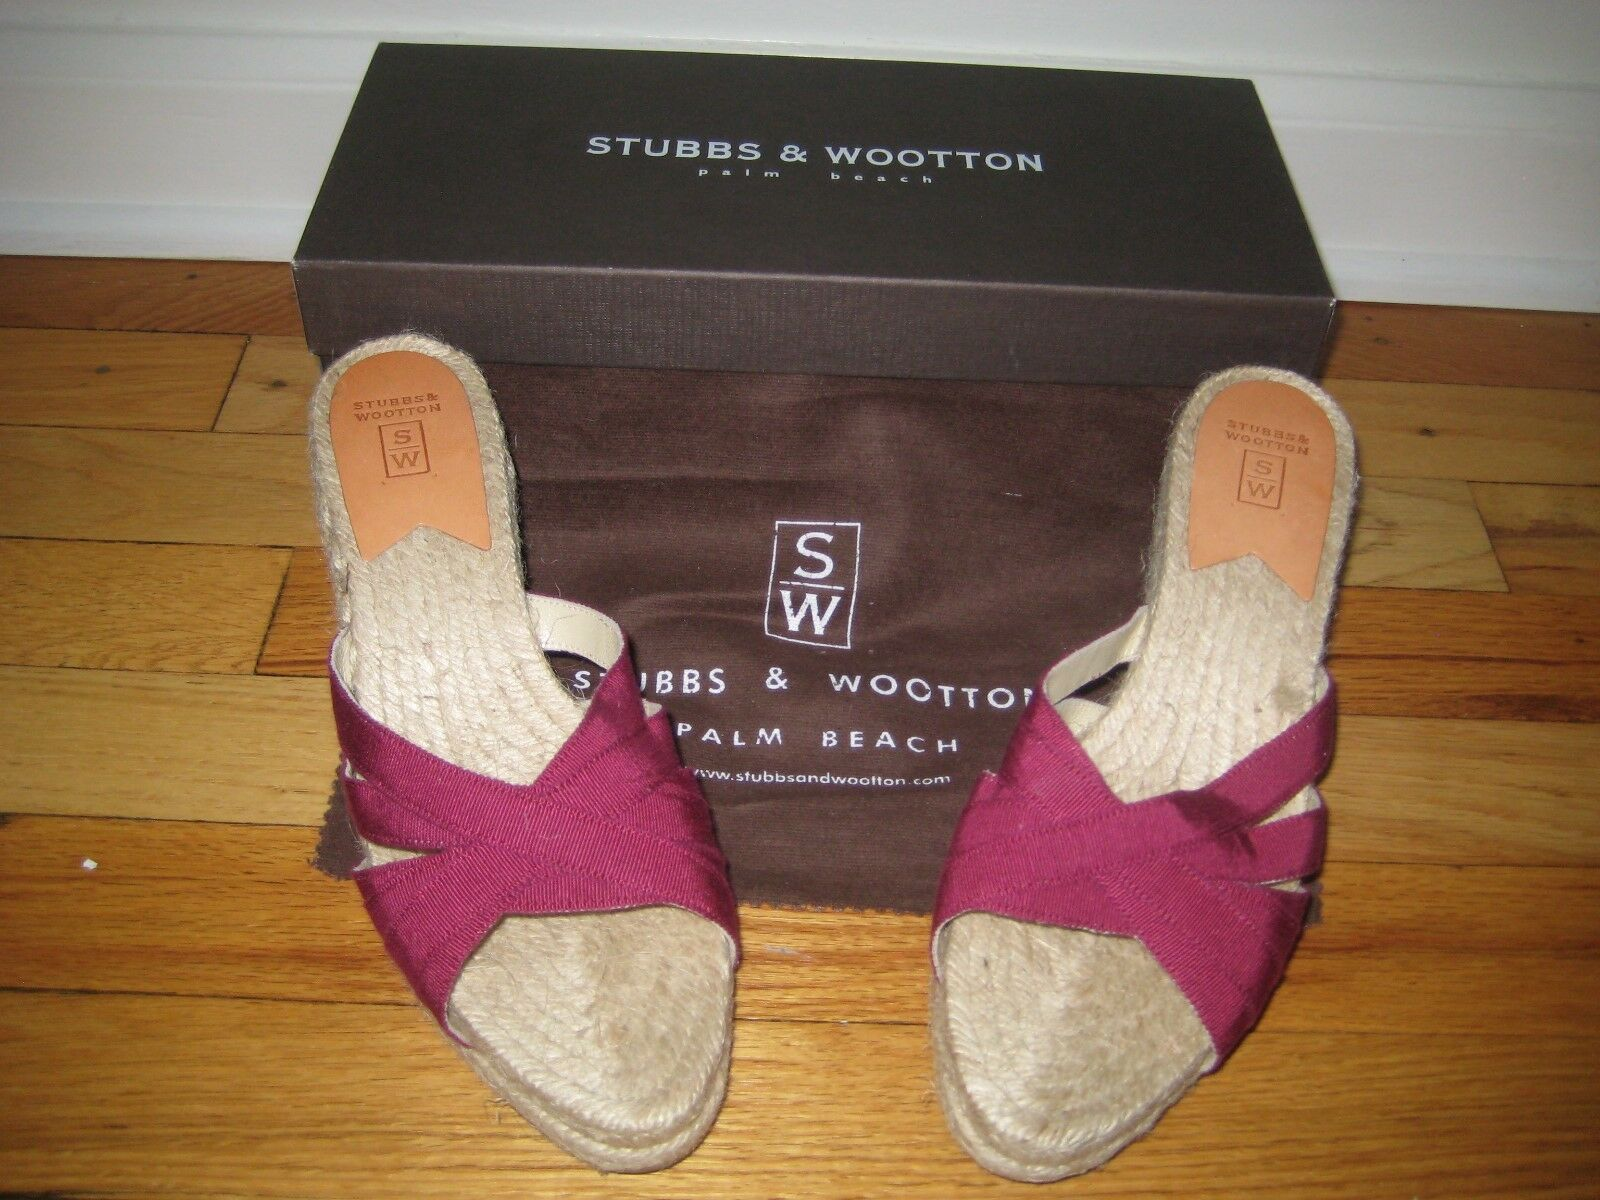 Nuevo En Caja Stubbs & Wootton púrpura vino Kelly Kelly Kelly Cuña Alpargatas 39  325 812940